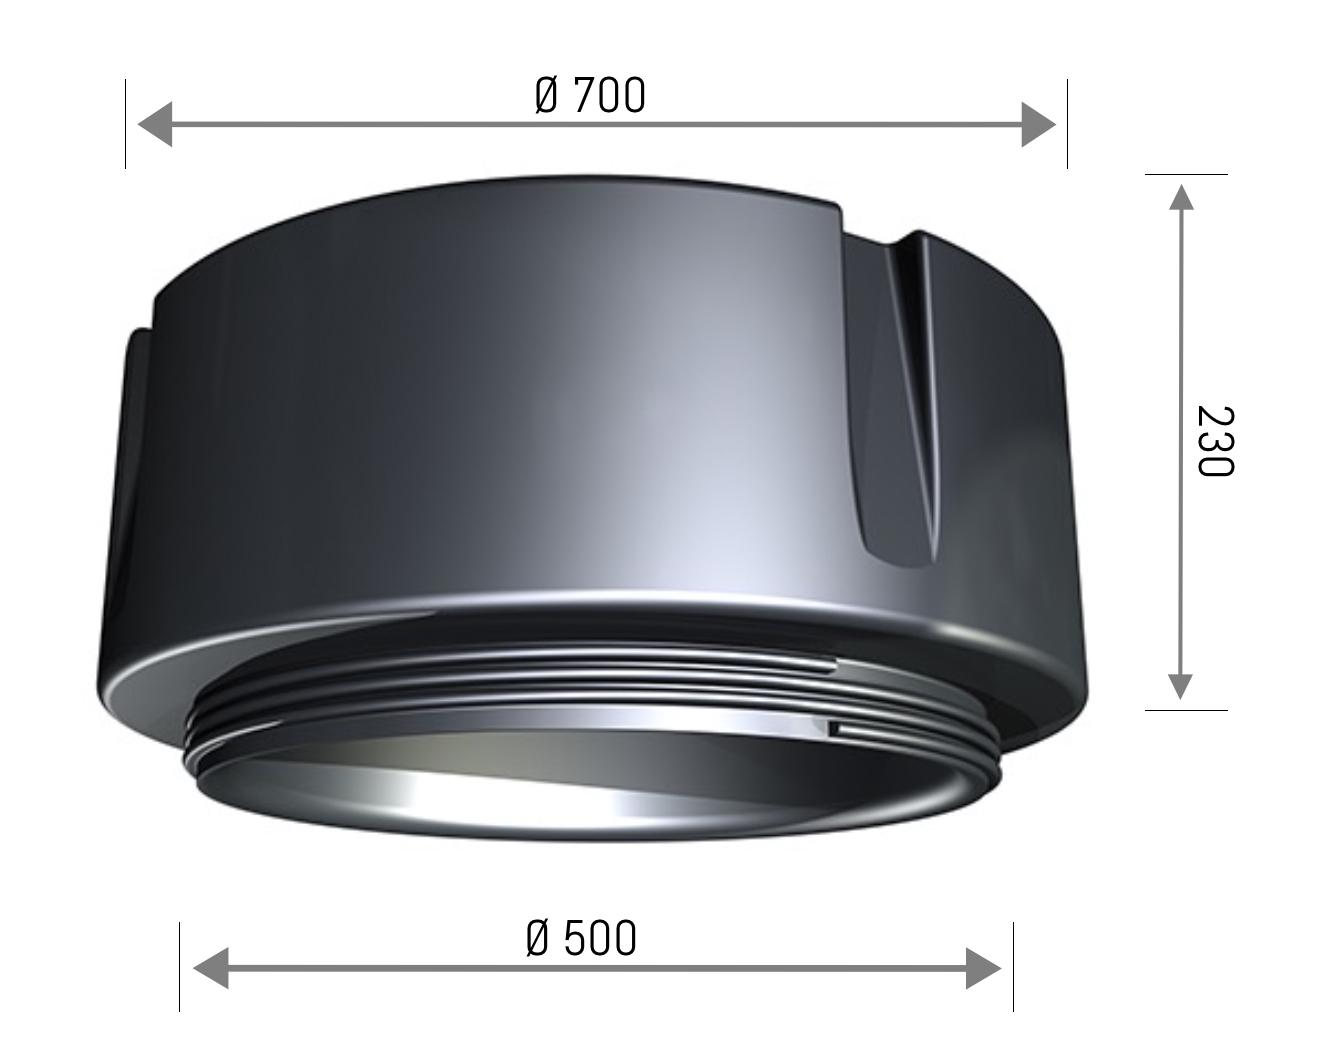 Technische-Details-Domverla-ngerung5729fed81f0dd